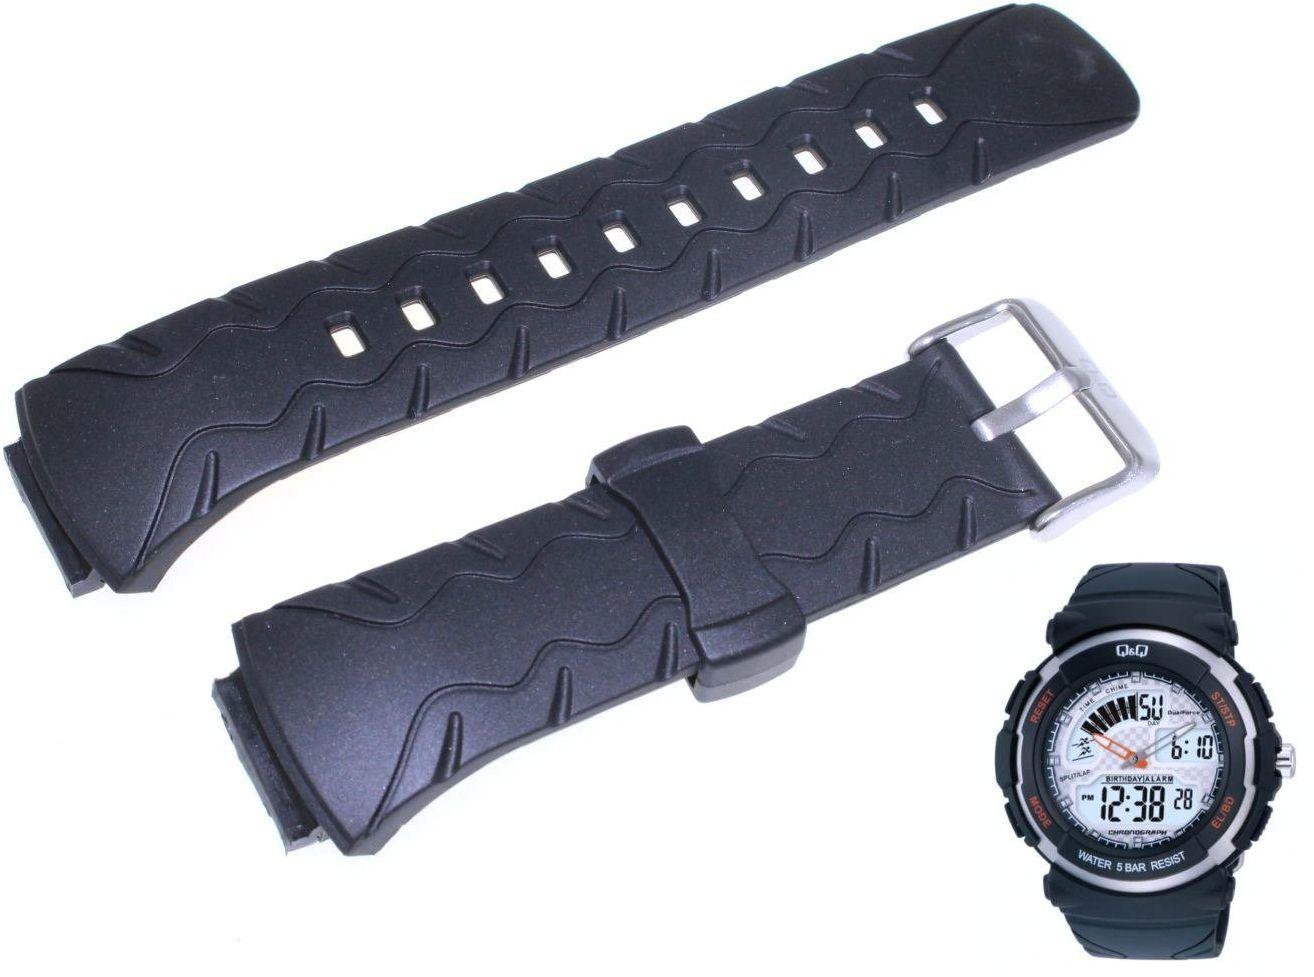 Pasek do zegarka Q&Q M012-001 18 mm Tworzywo